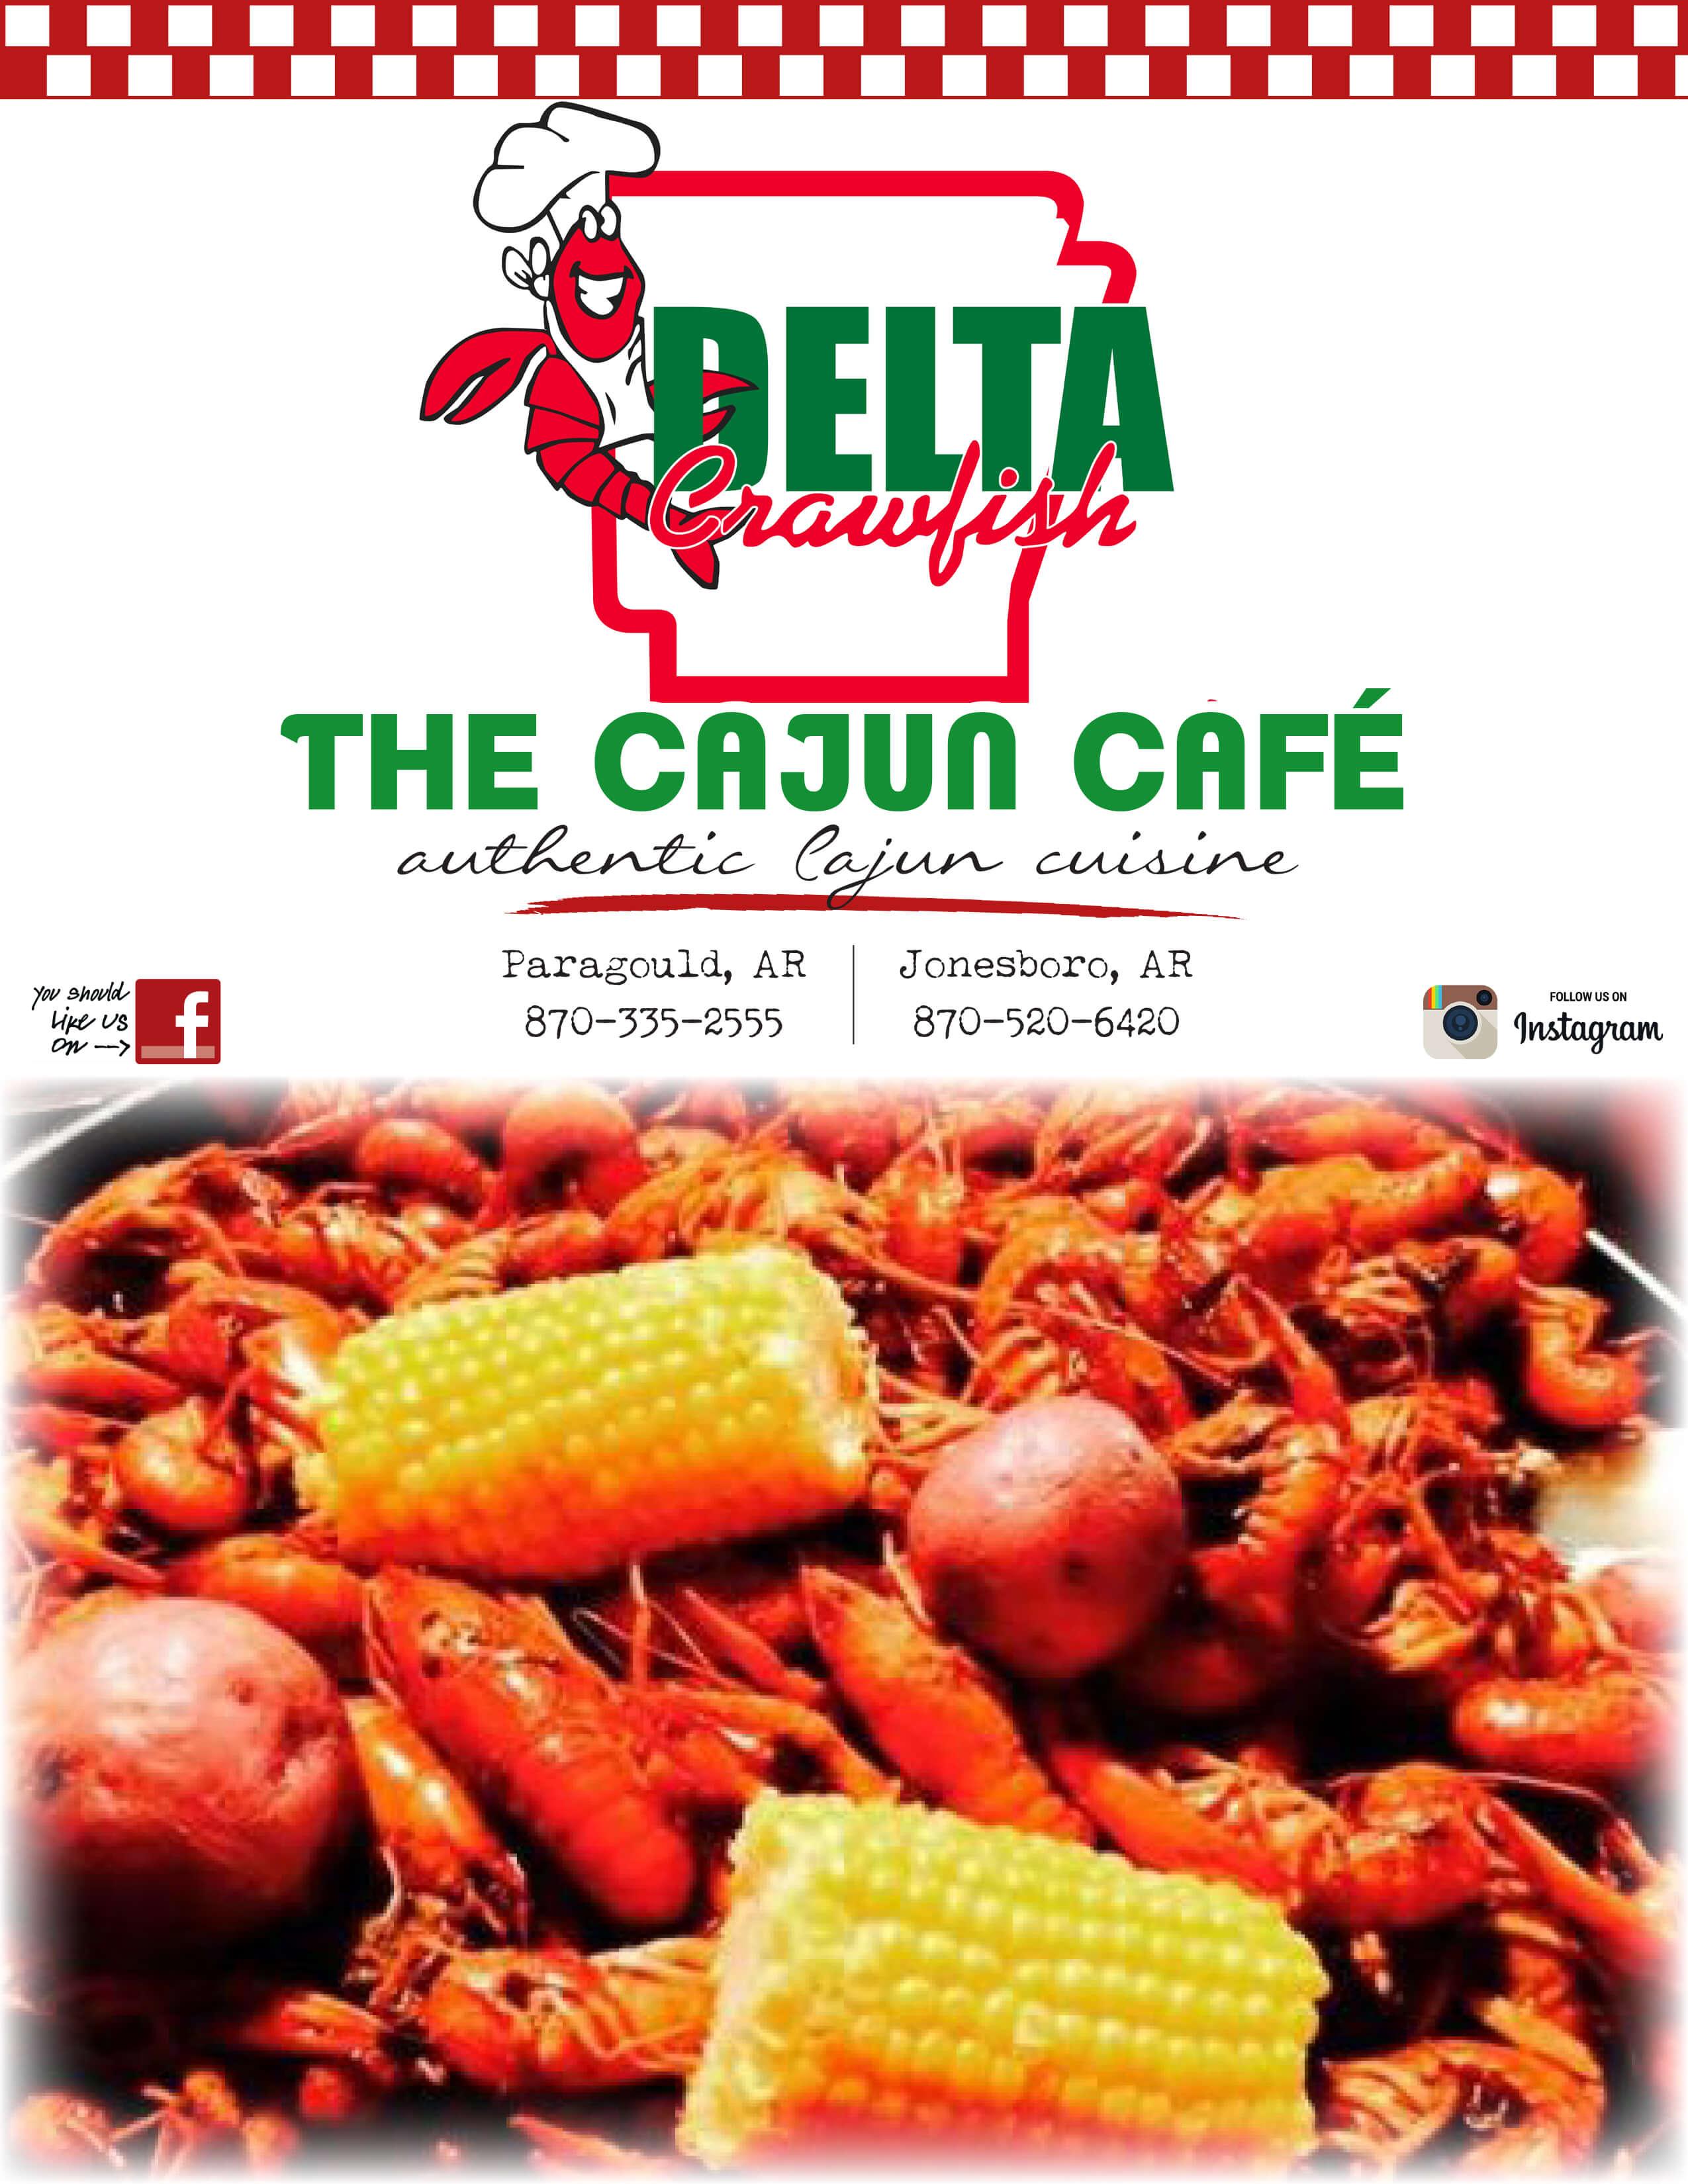 Delta Crawfish Delta Crawfish Cajun Cafe